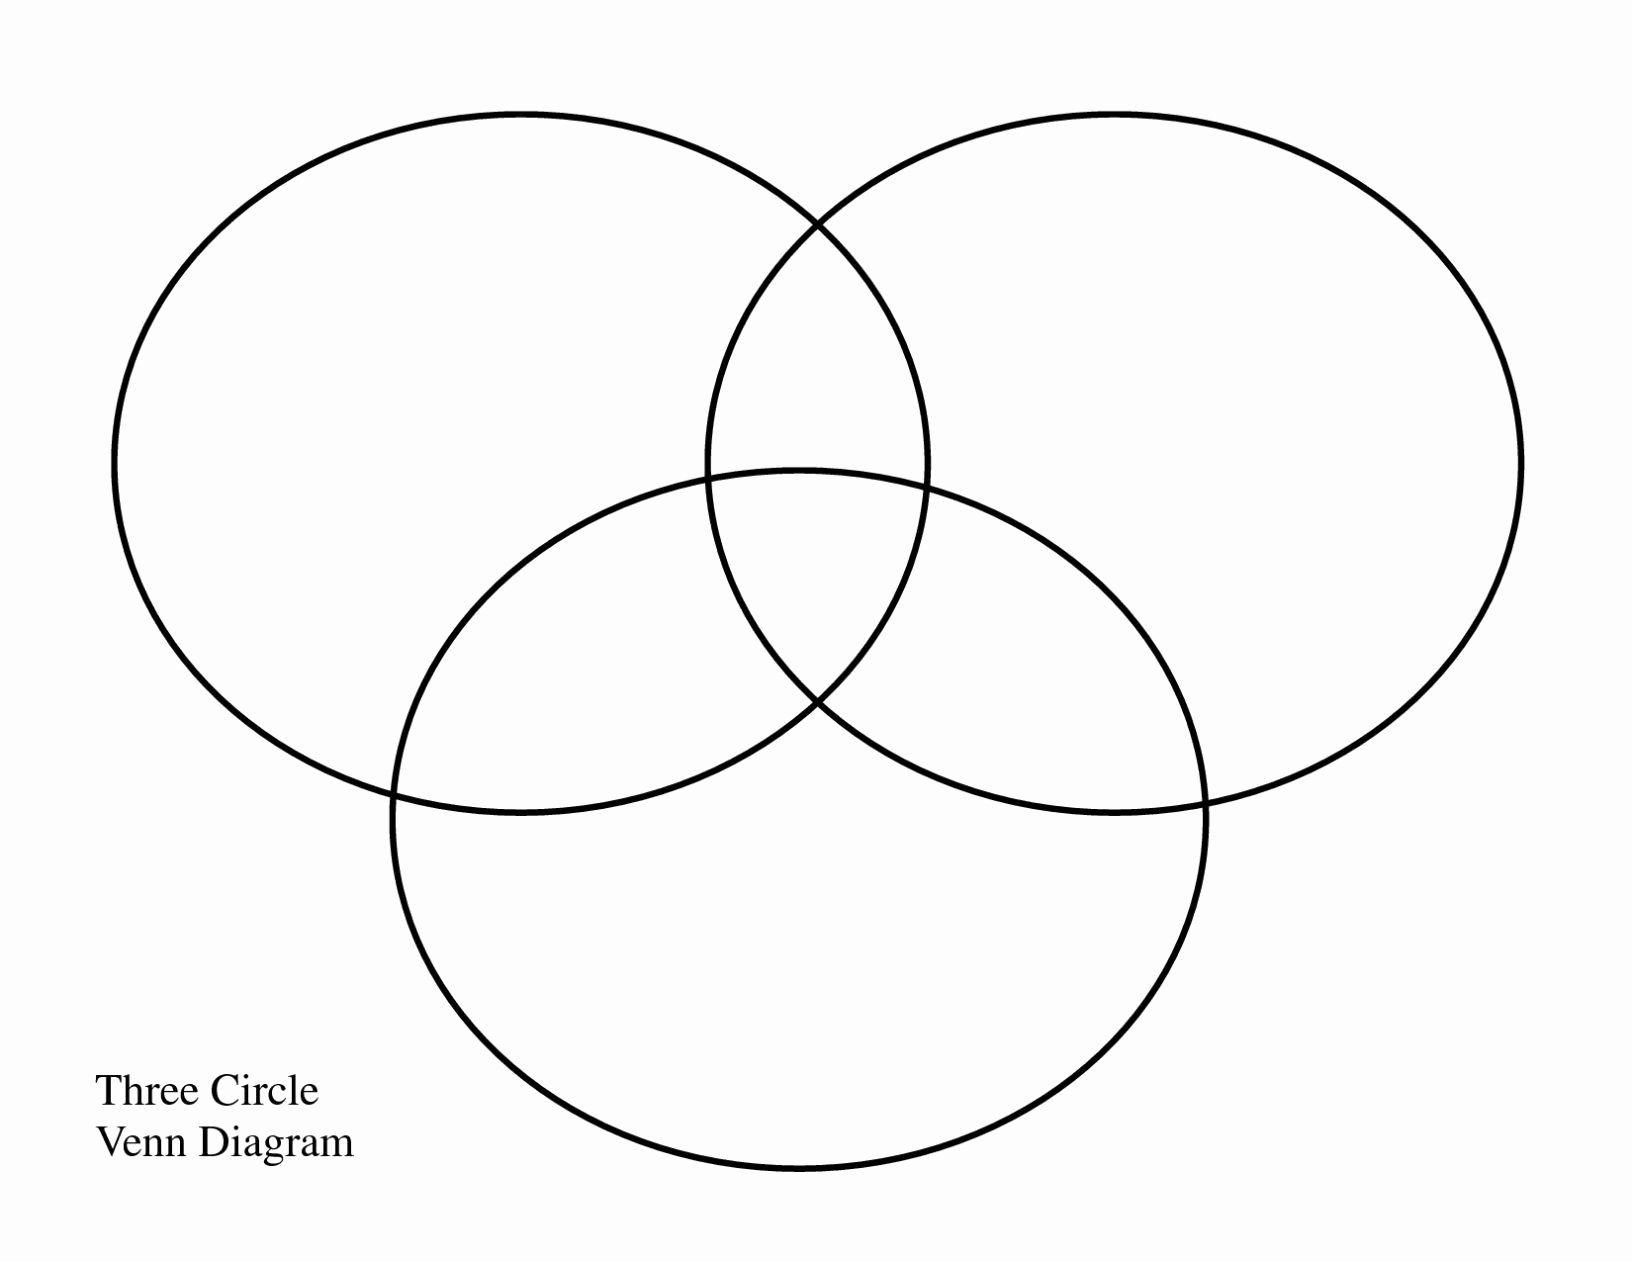 Venn Diagram Template Doc Fresh Printable Blank Venn